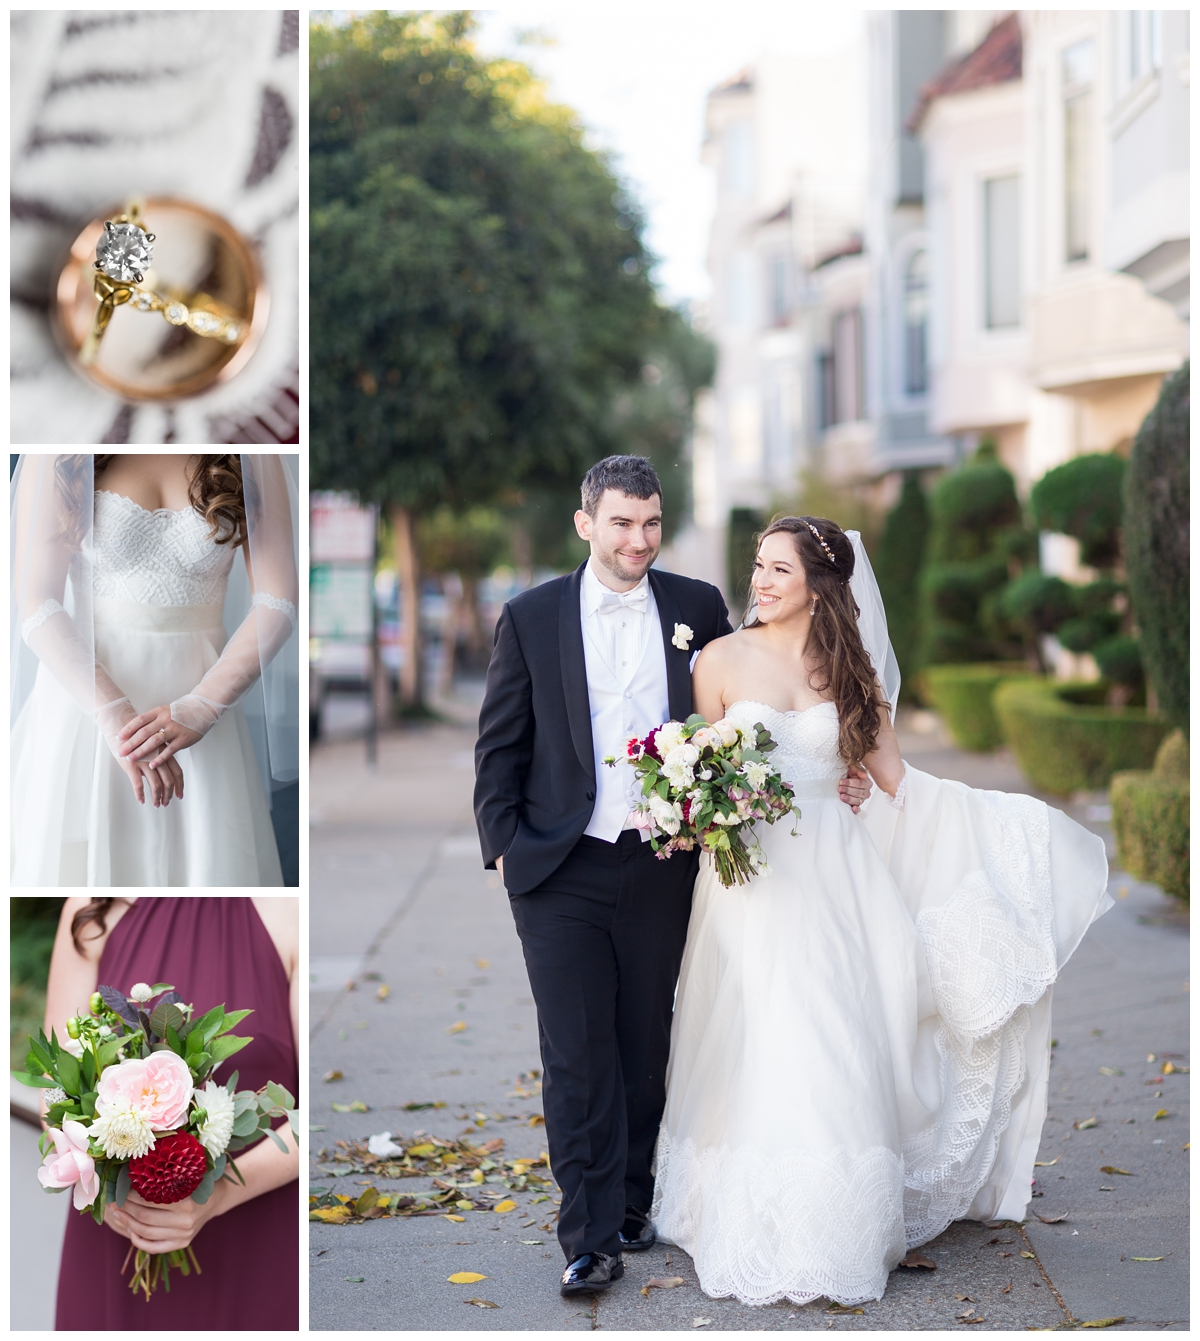 San-Francisco-Wedding-Photographer-Gallery-308_2054.jpg